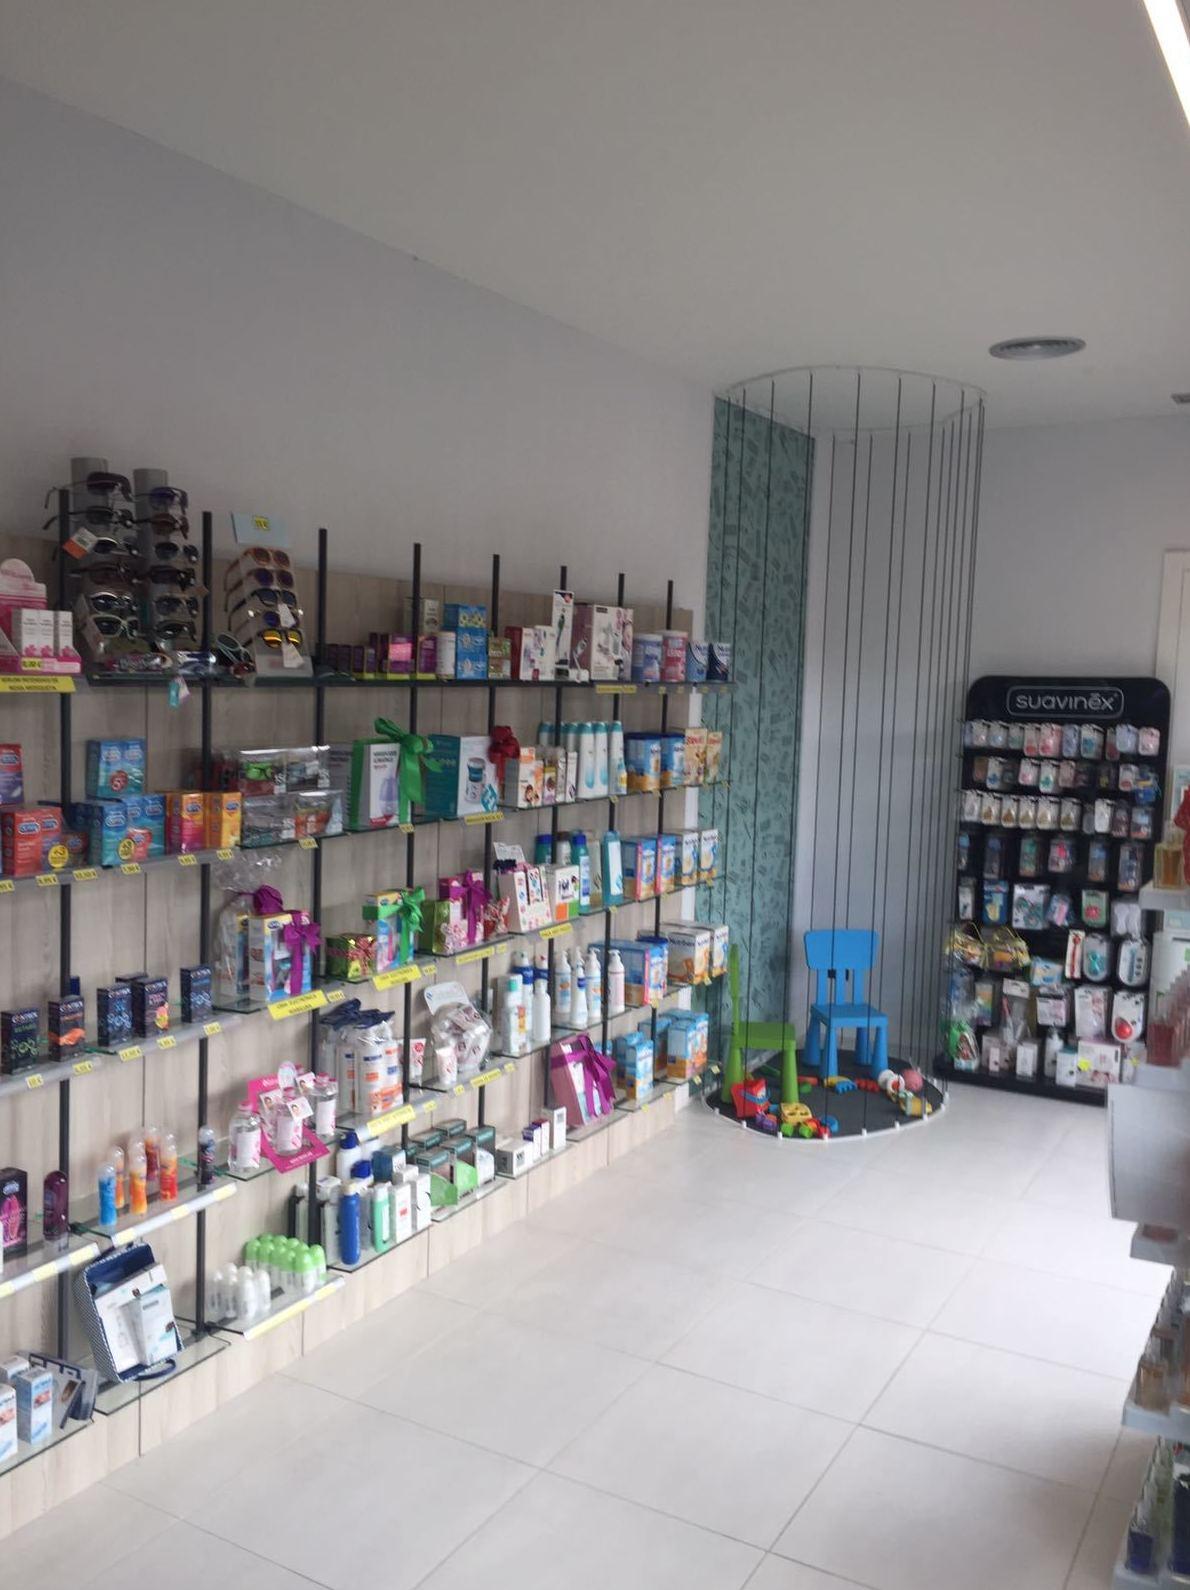 Foto 1 de Farmacias en Burgos | Farmacia Margarita Medrano Ruiz